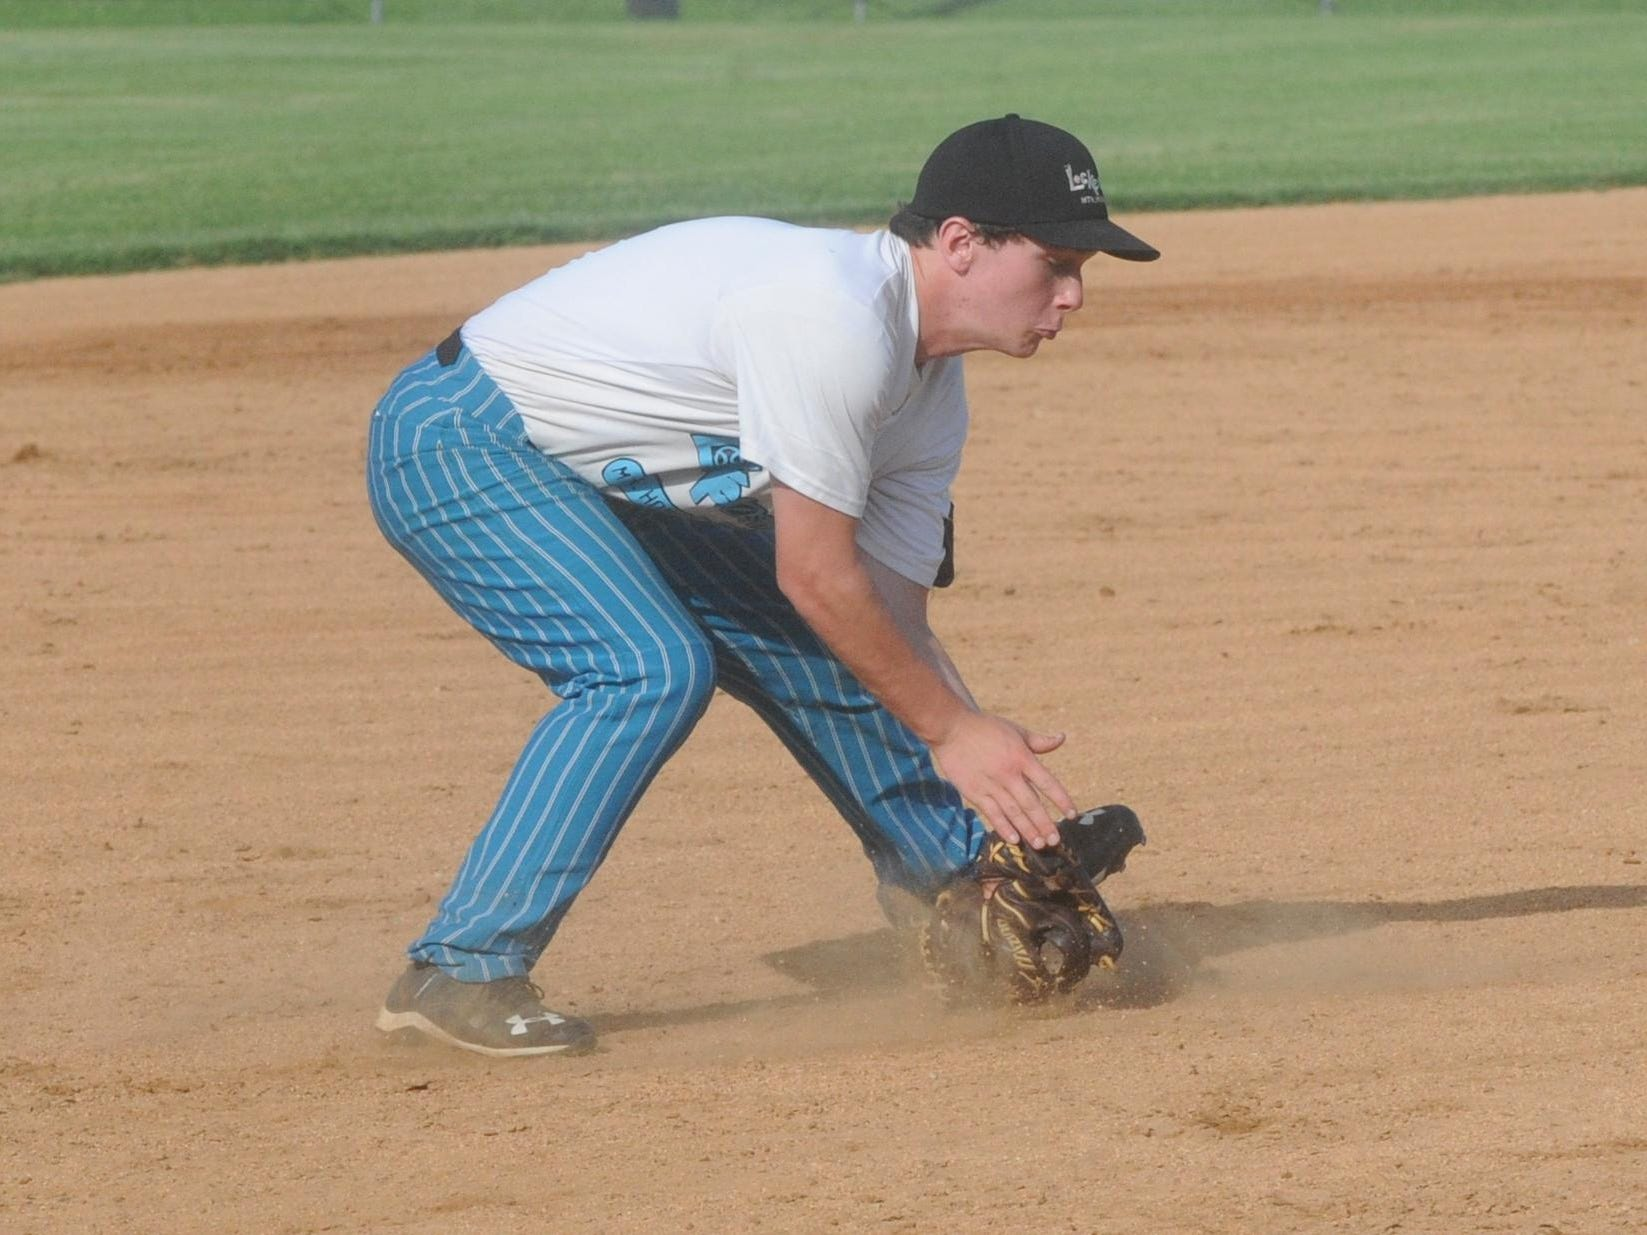 Lockeroom's Quinn Ellison fields a ground ball at third base during a recent game at Cooper Park.